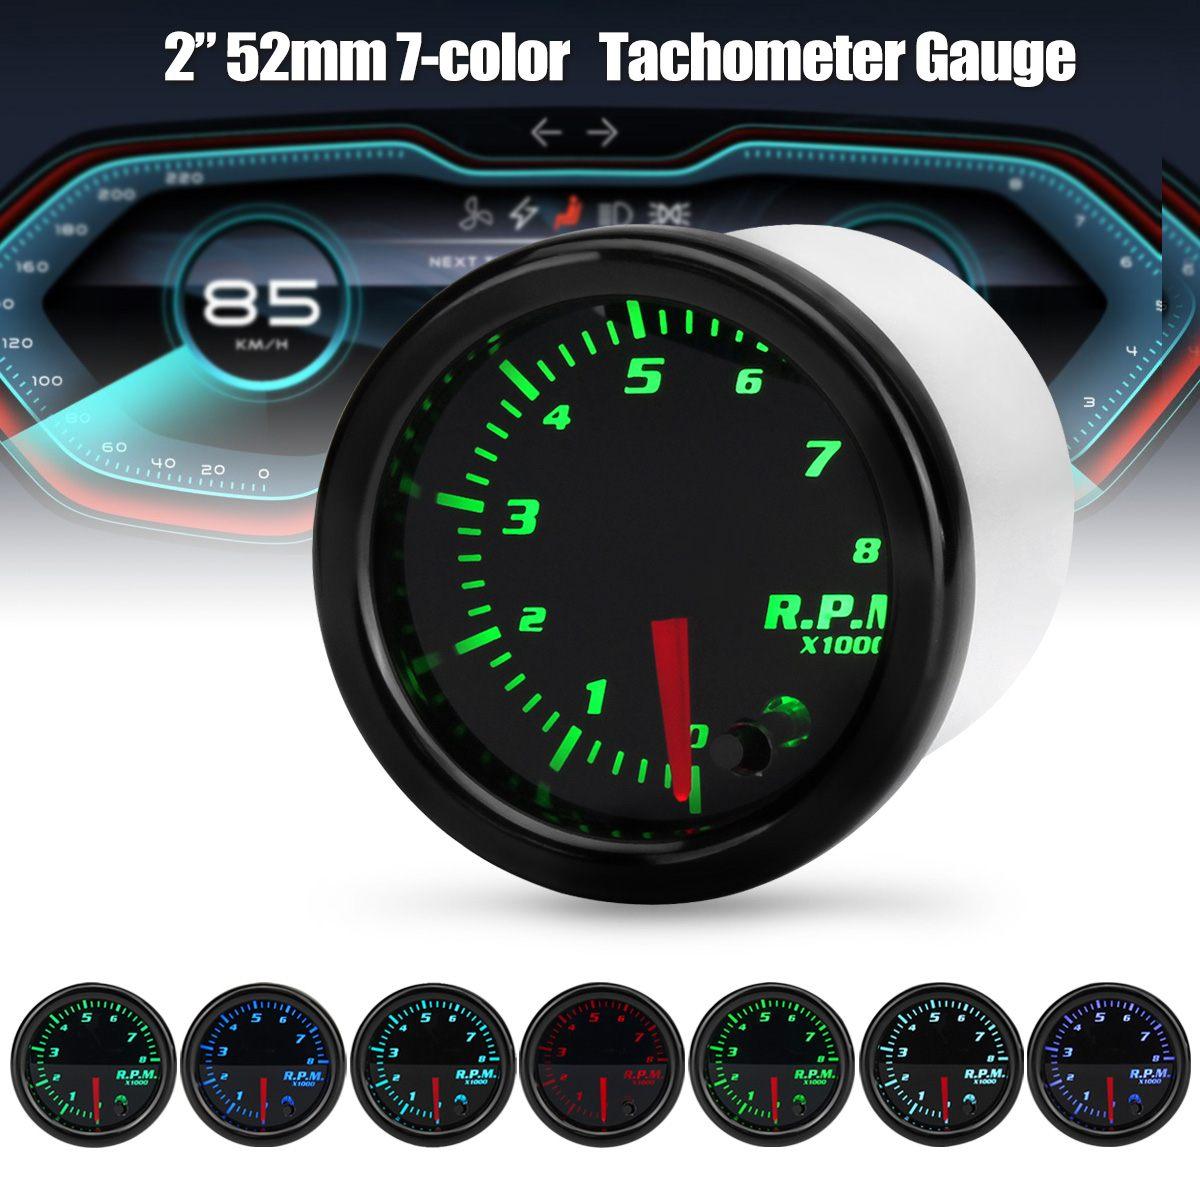 2 Polegada 52mm 12v carro tacômetro rpm 7 cor led display digital 0-8000 rpm universal carro tach medidor